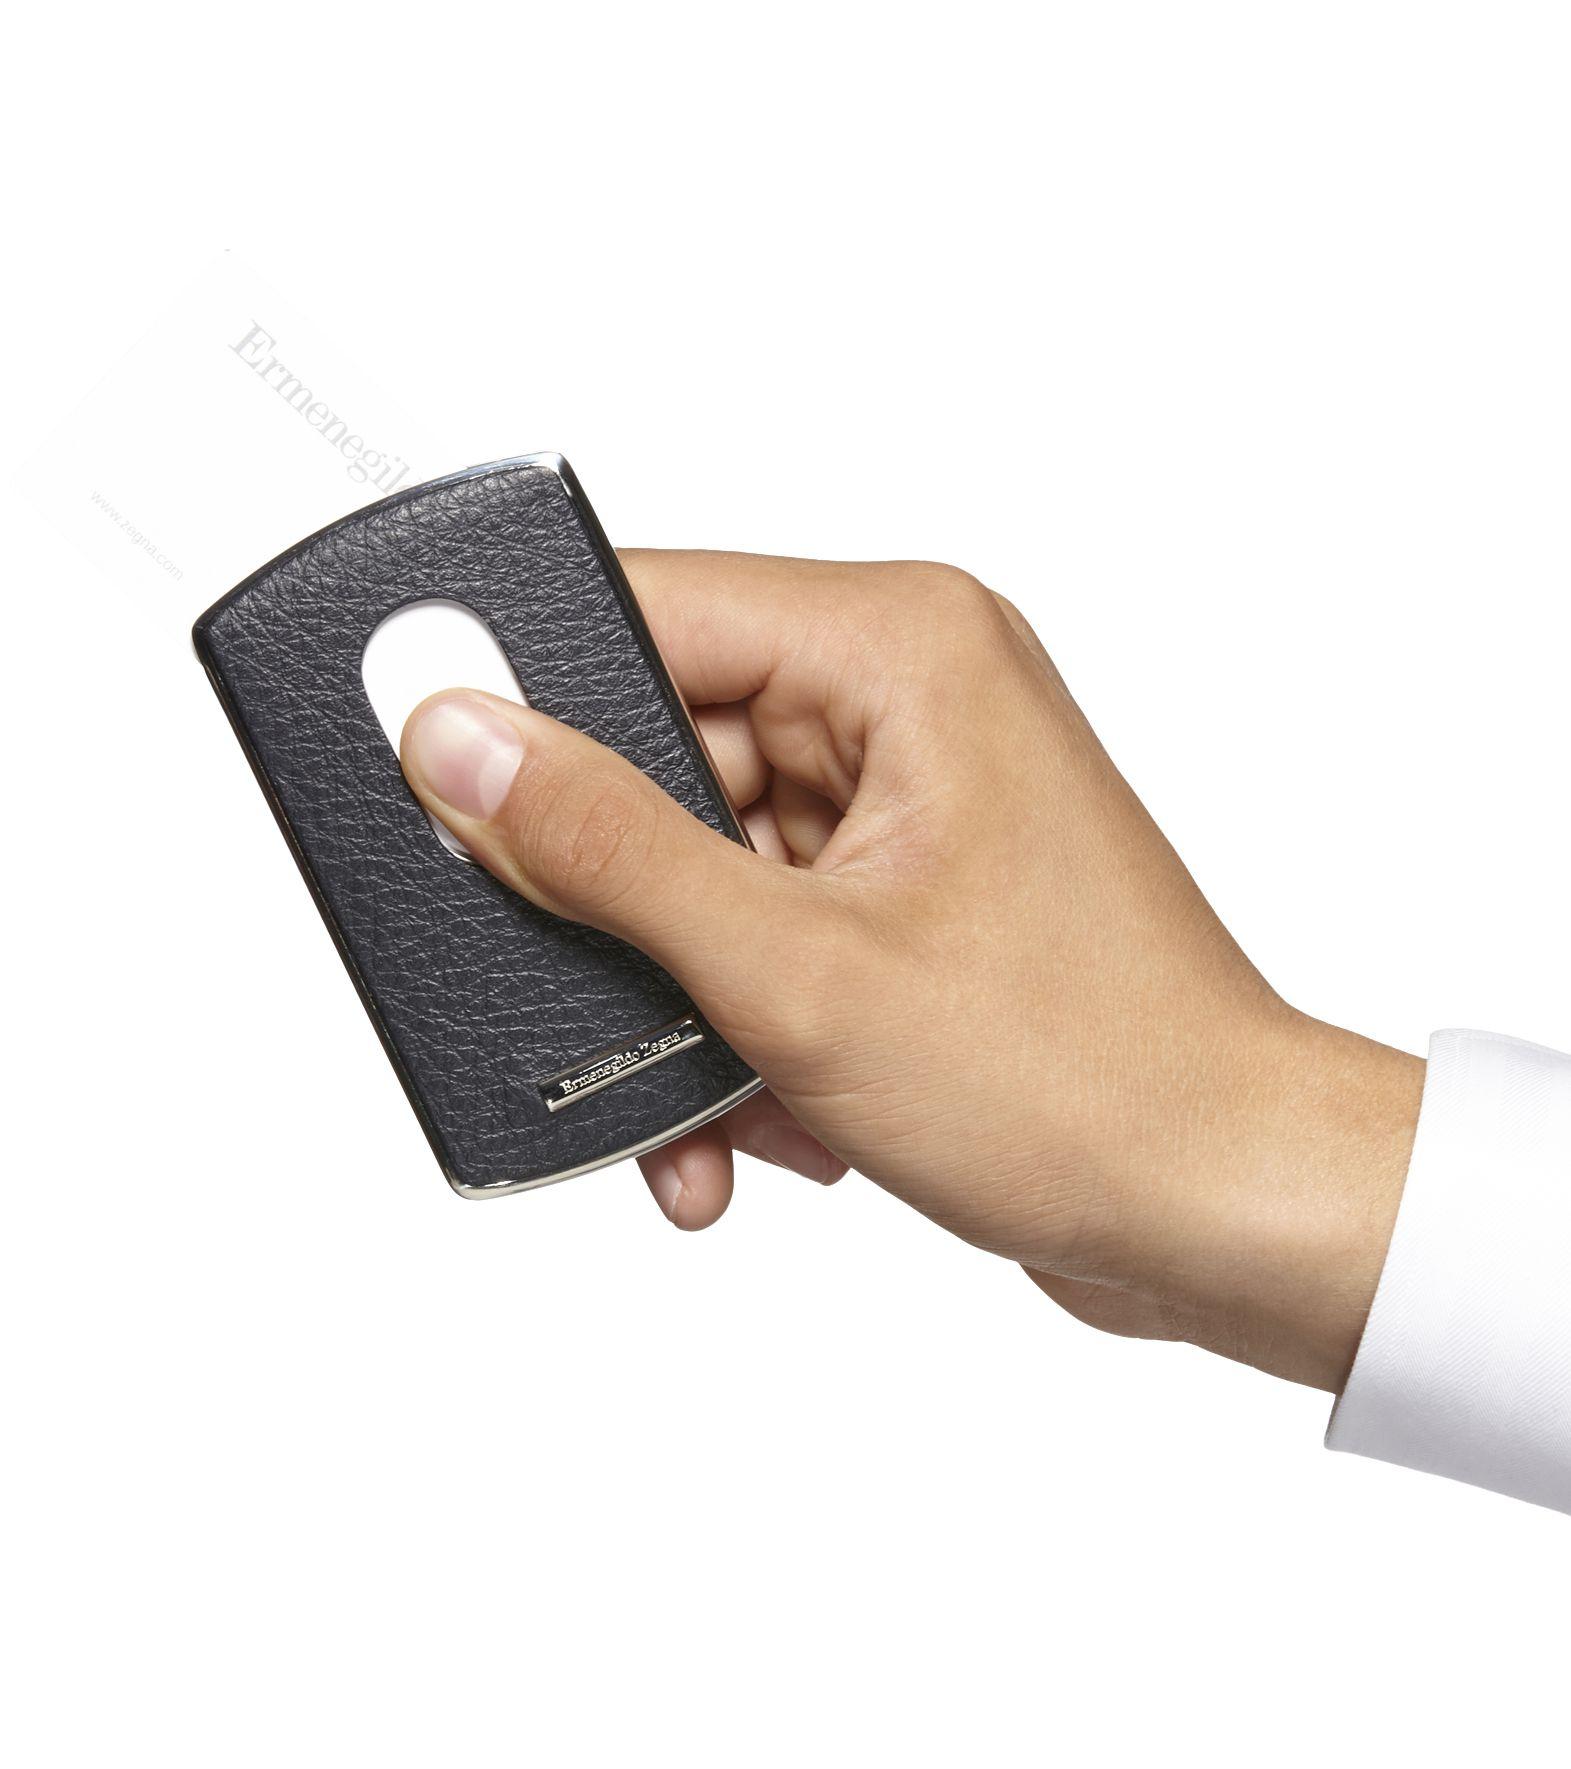 Business card holder zegna gallery card design and card template business card holder zegna gallery card design and card template business card holder zegna choice image reheart Images